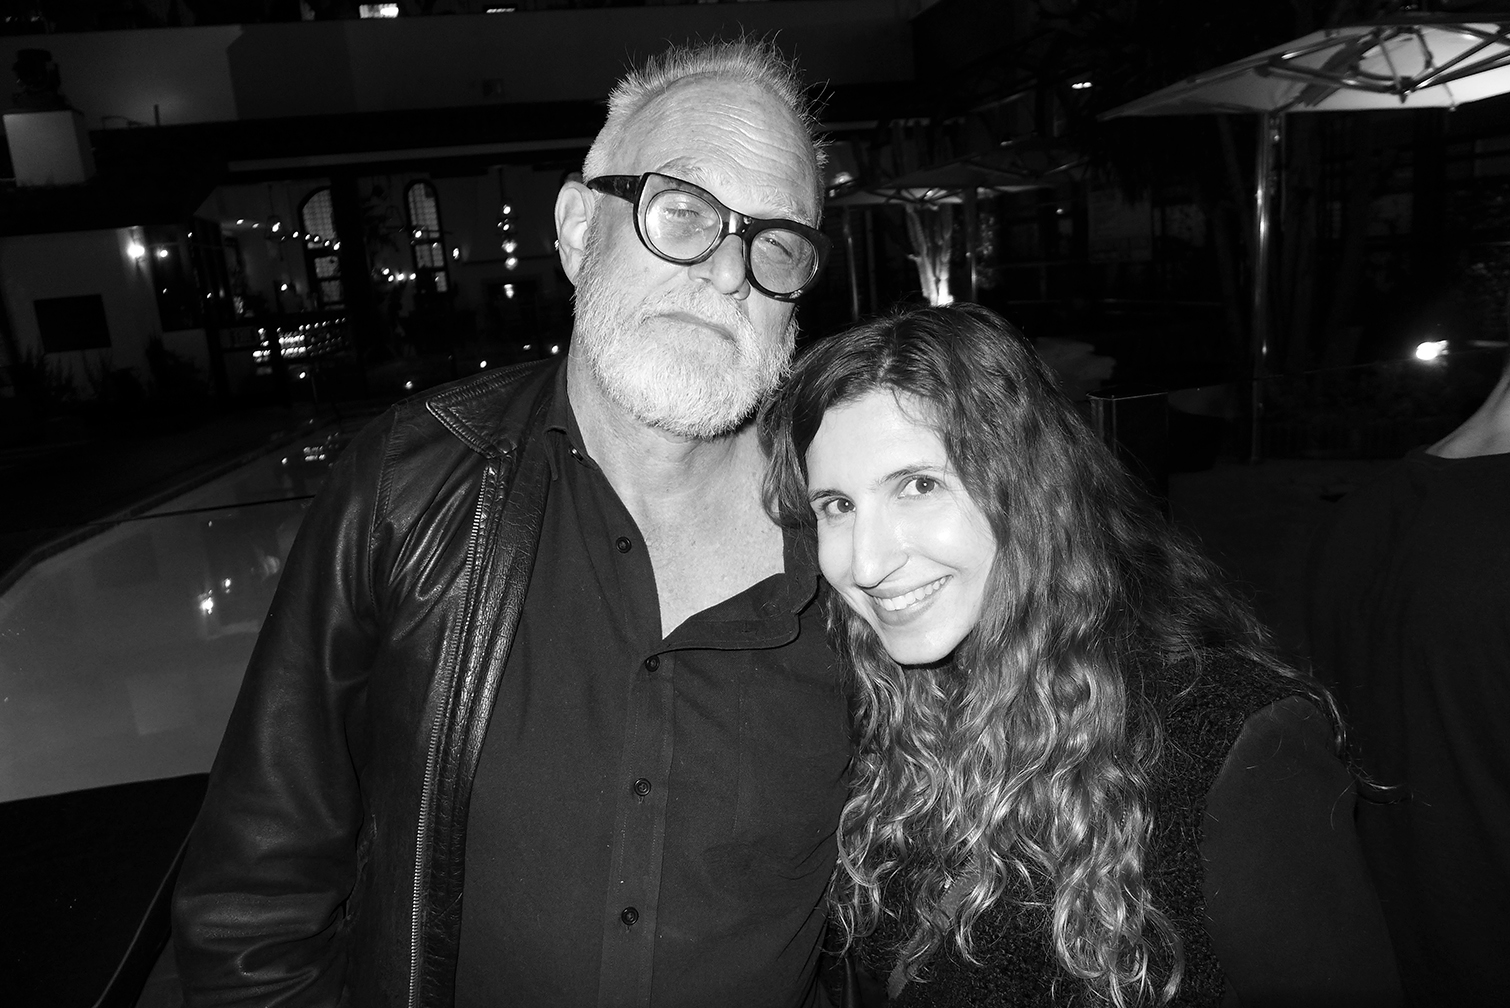 Robert Yarber & Friend